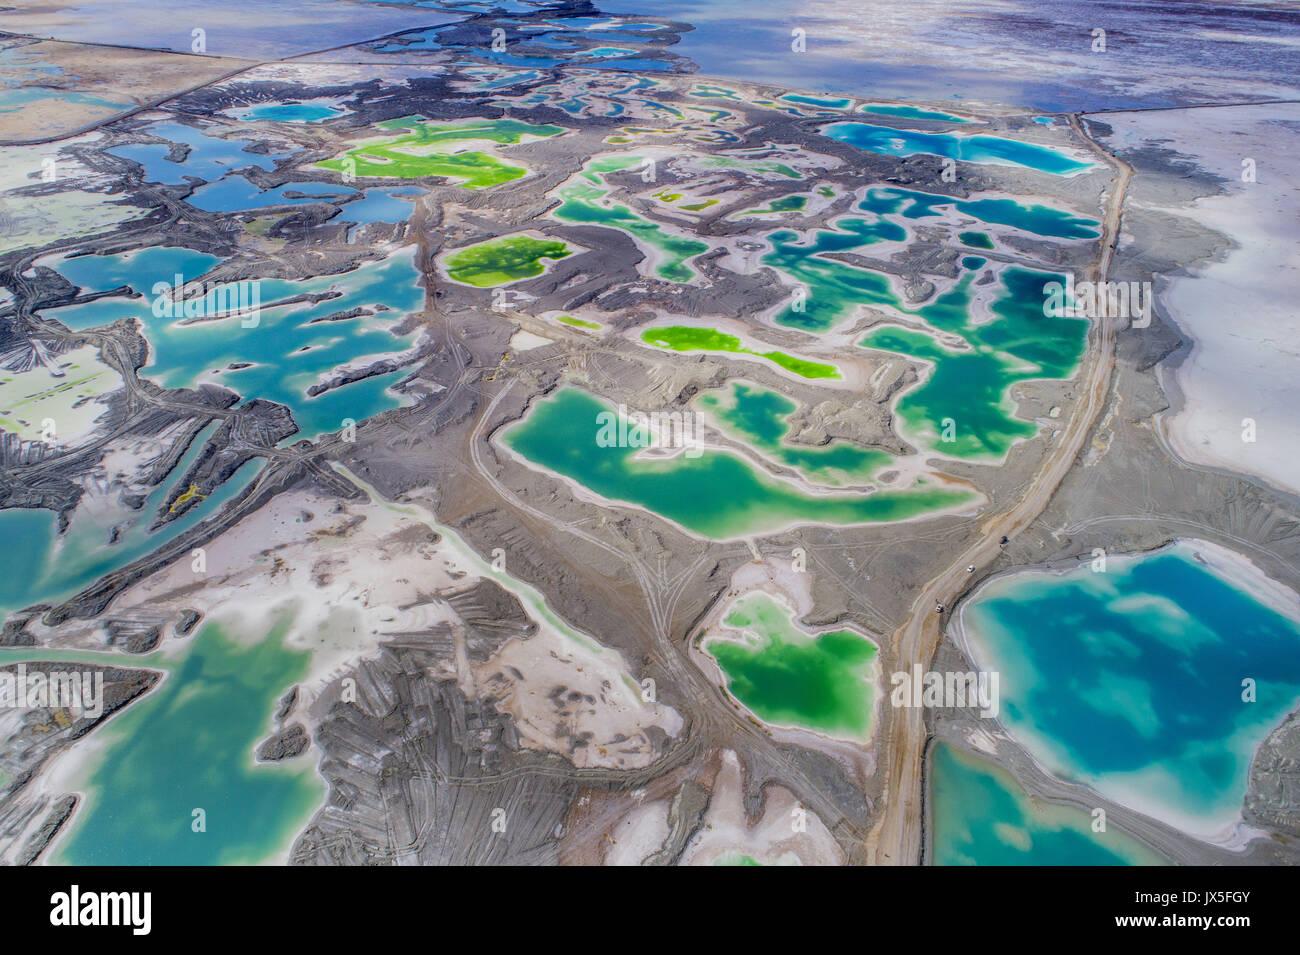 Qinghai, Qinghai, China. 15th Aug, 2017. The Emerald Lake is the salt lake located in northwest China's Qinghai - Stock Image